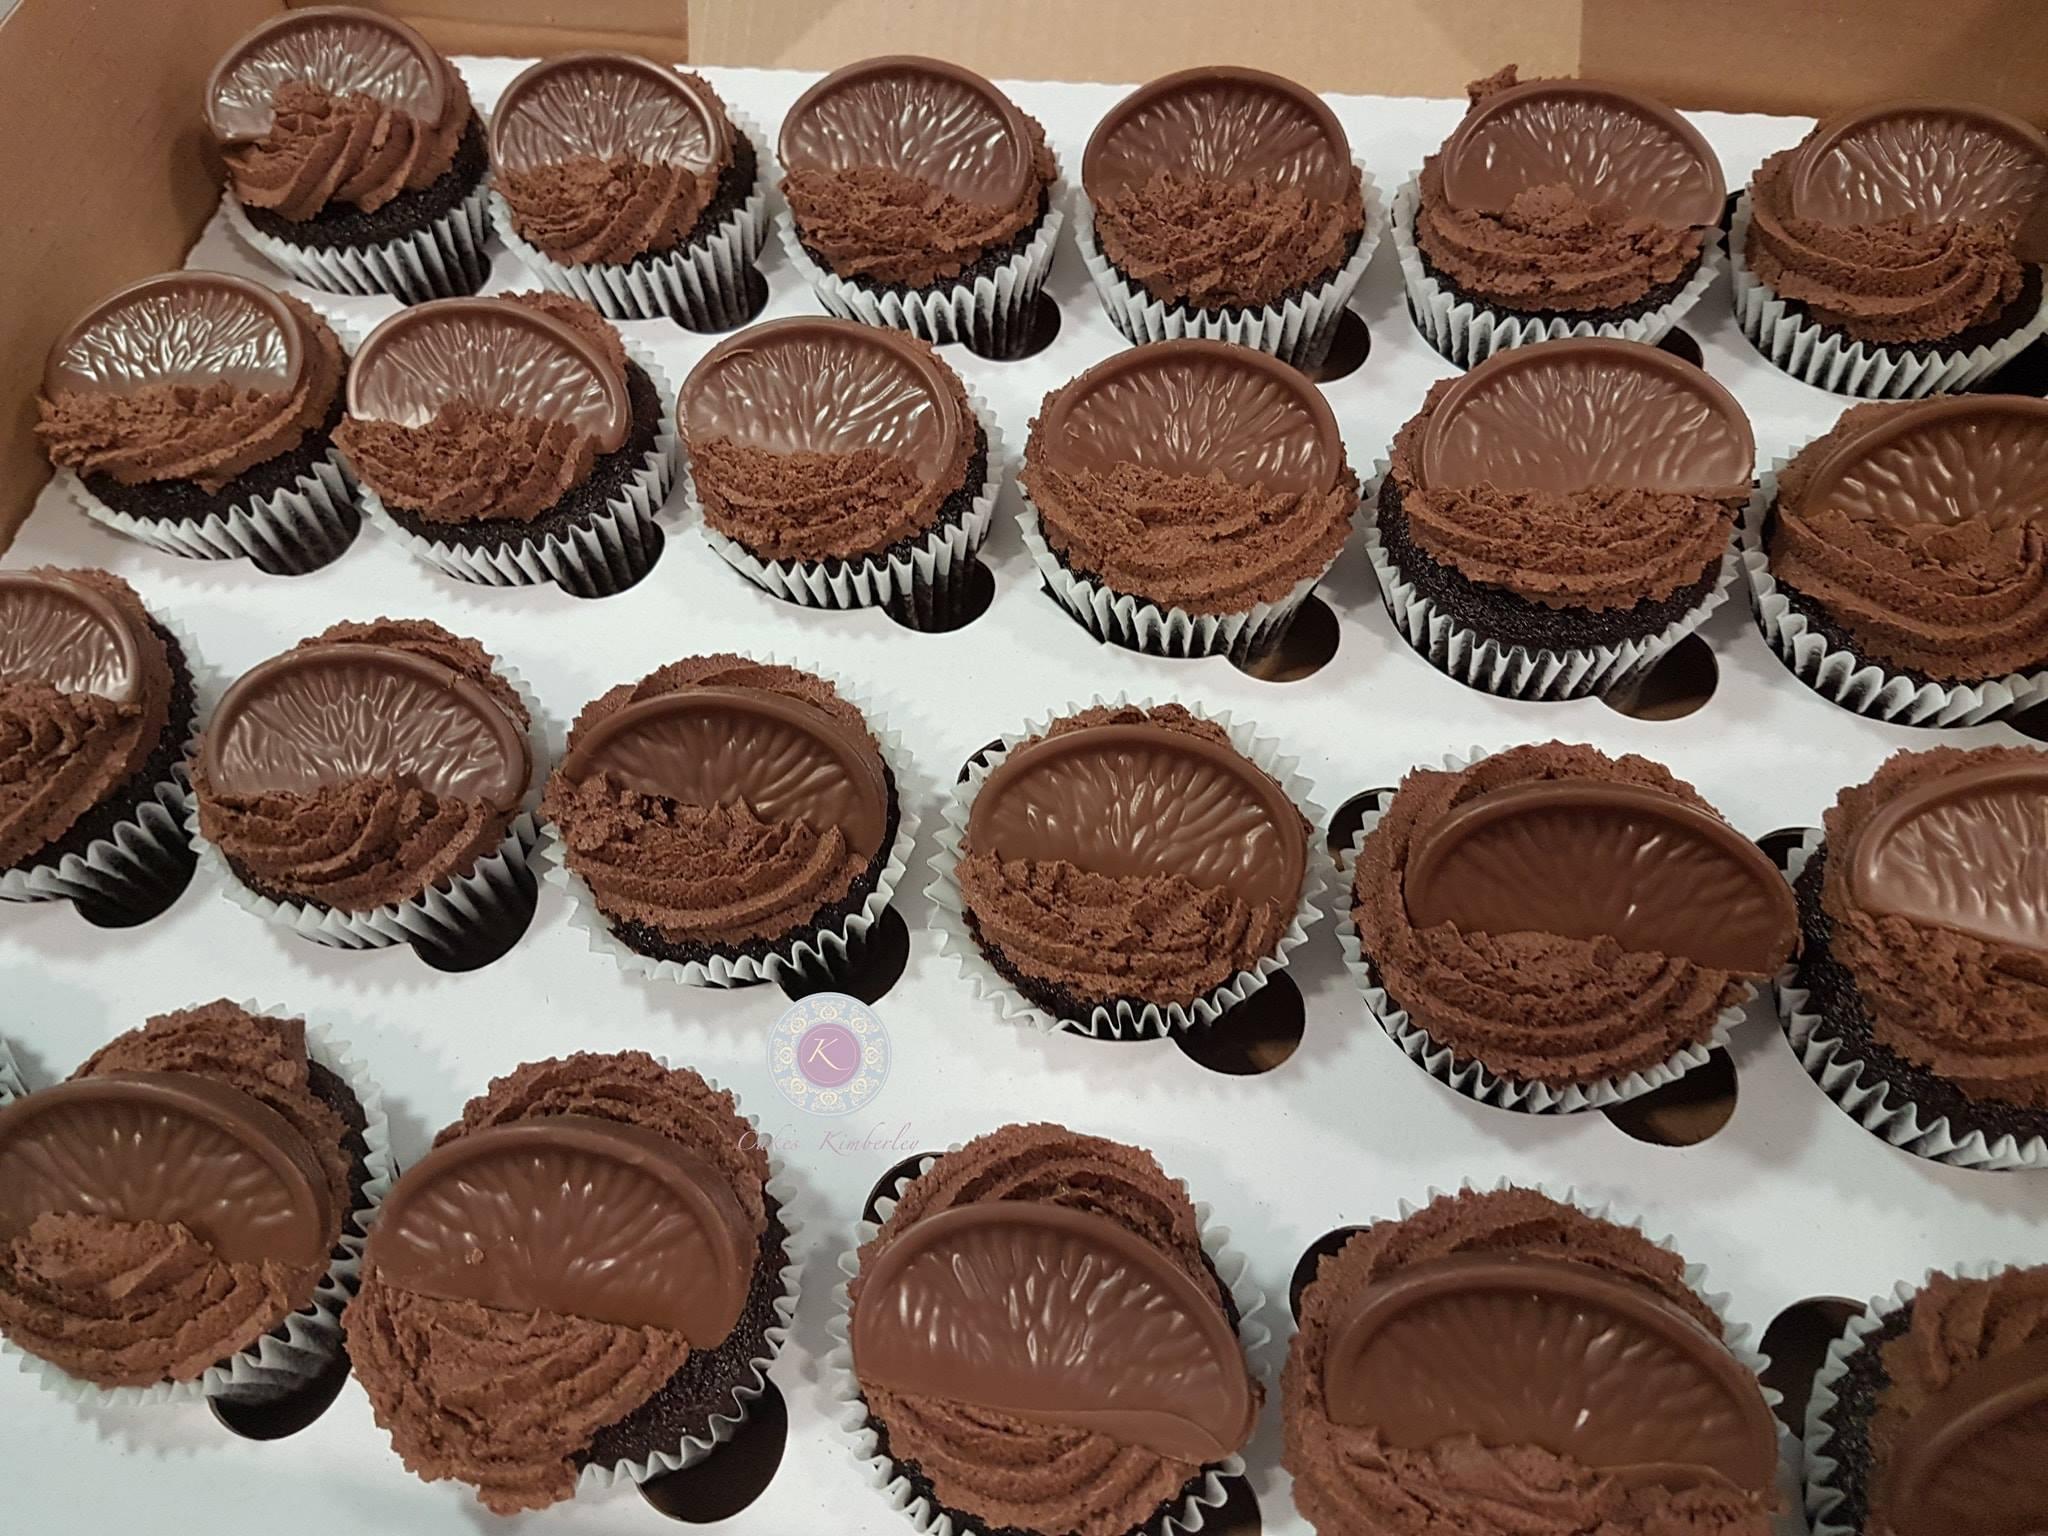 Cupcakes - Chocolate orange